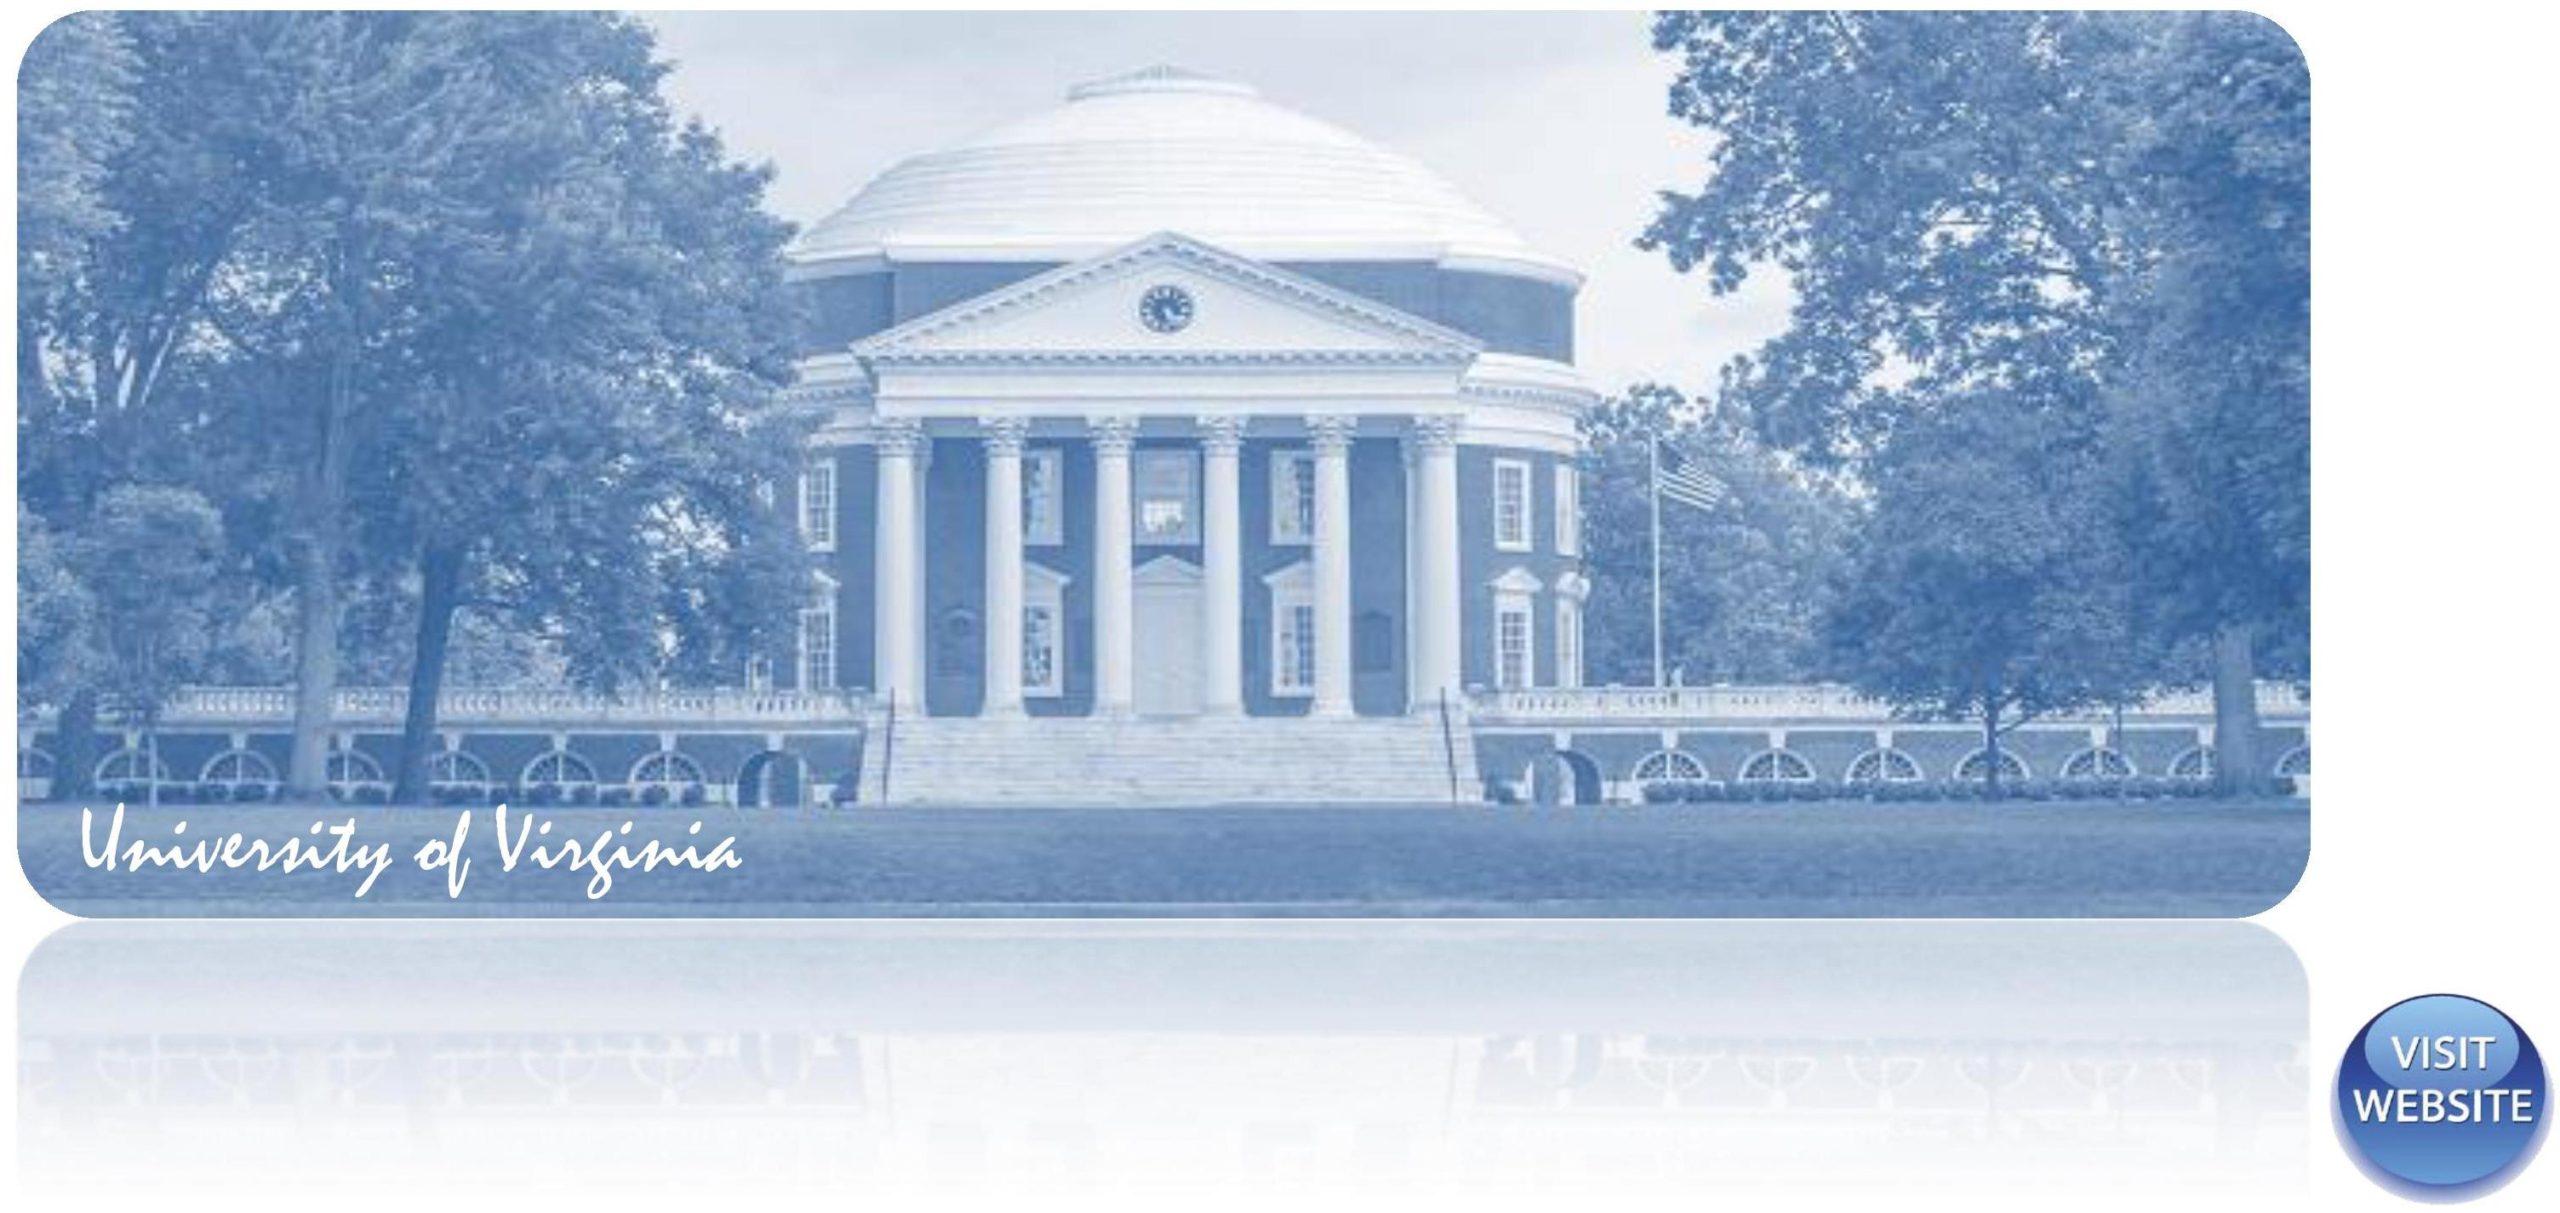 University of Virginia USA